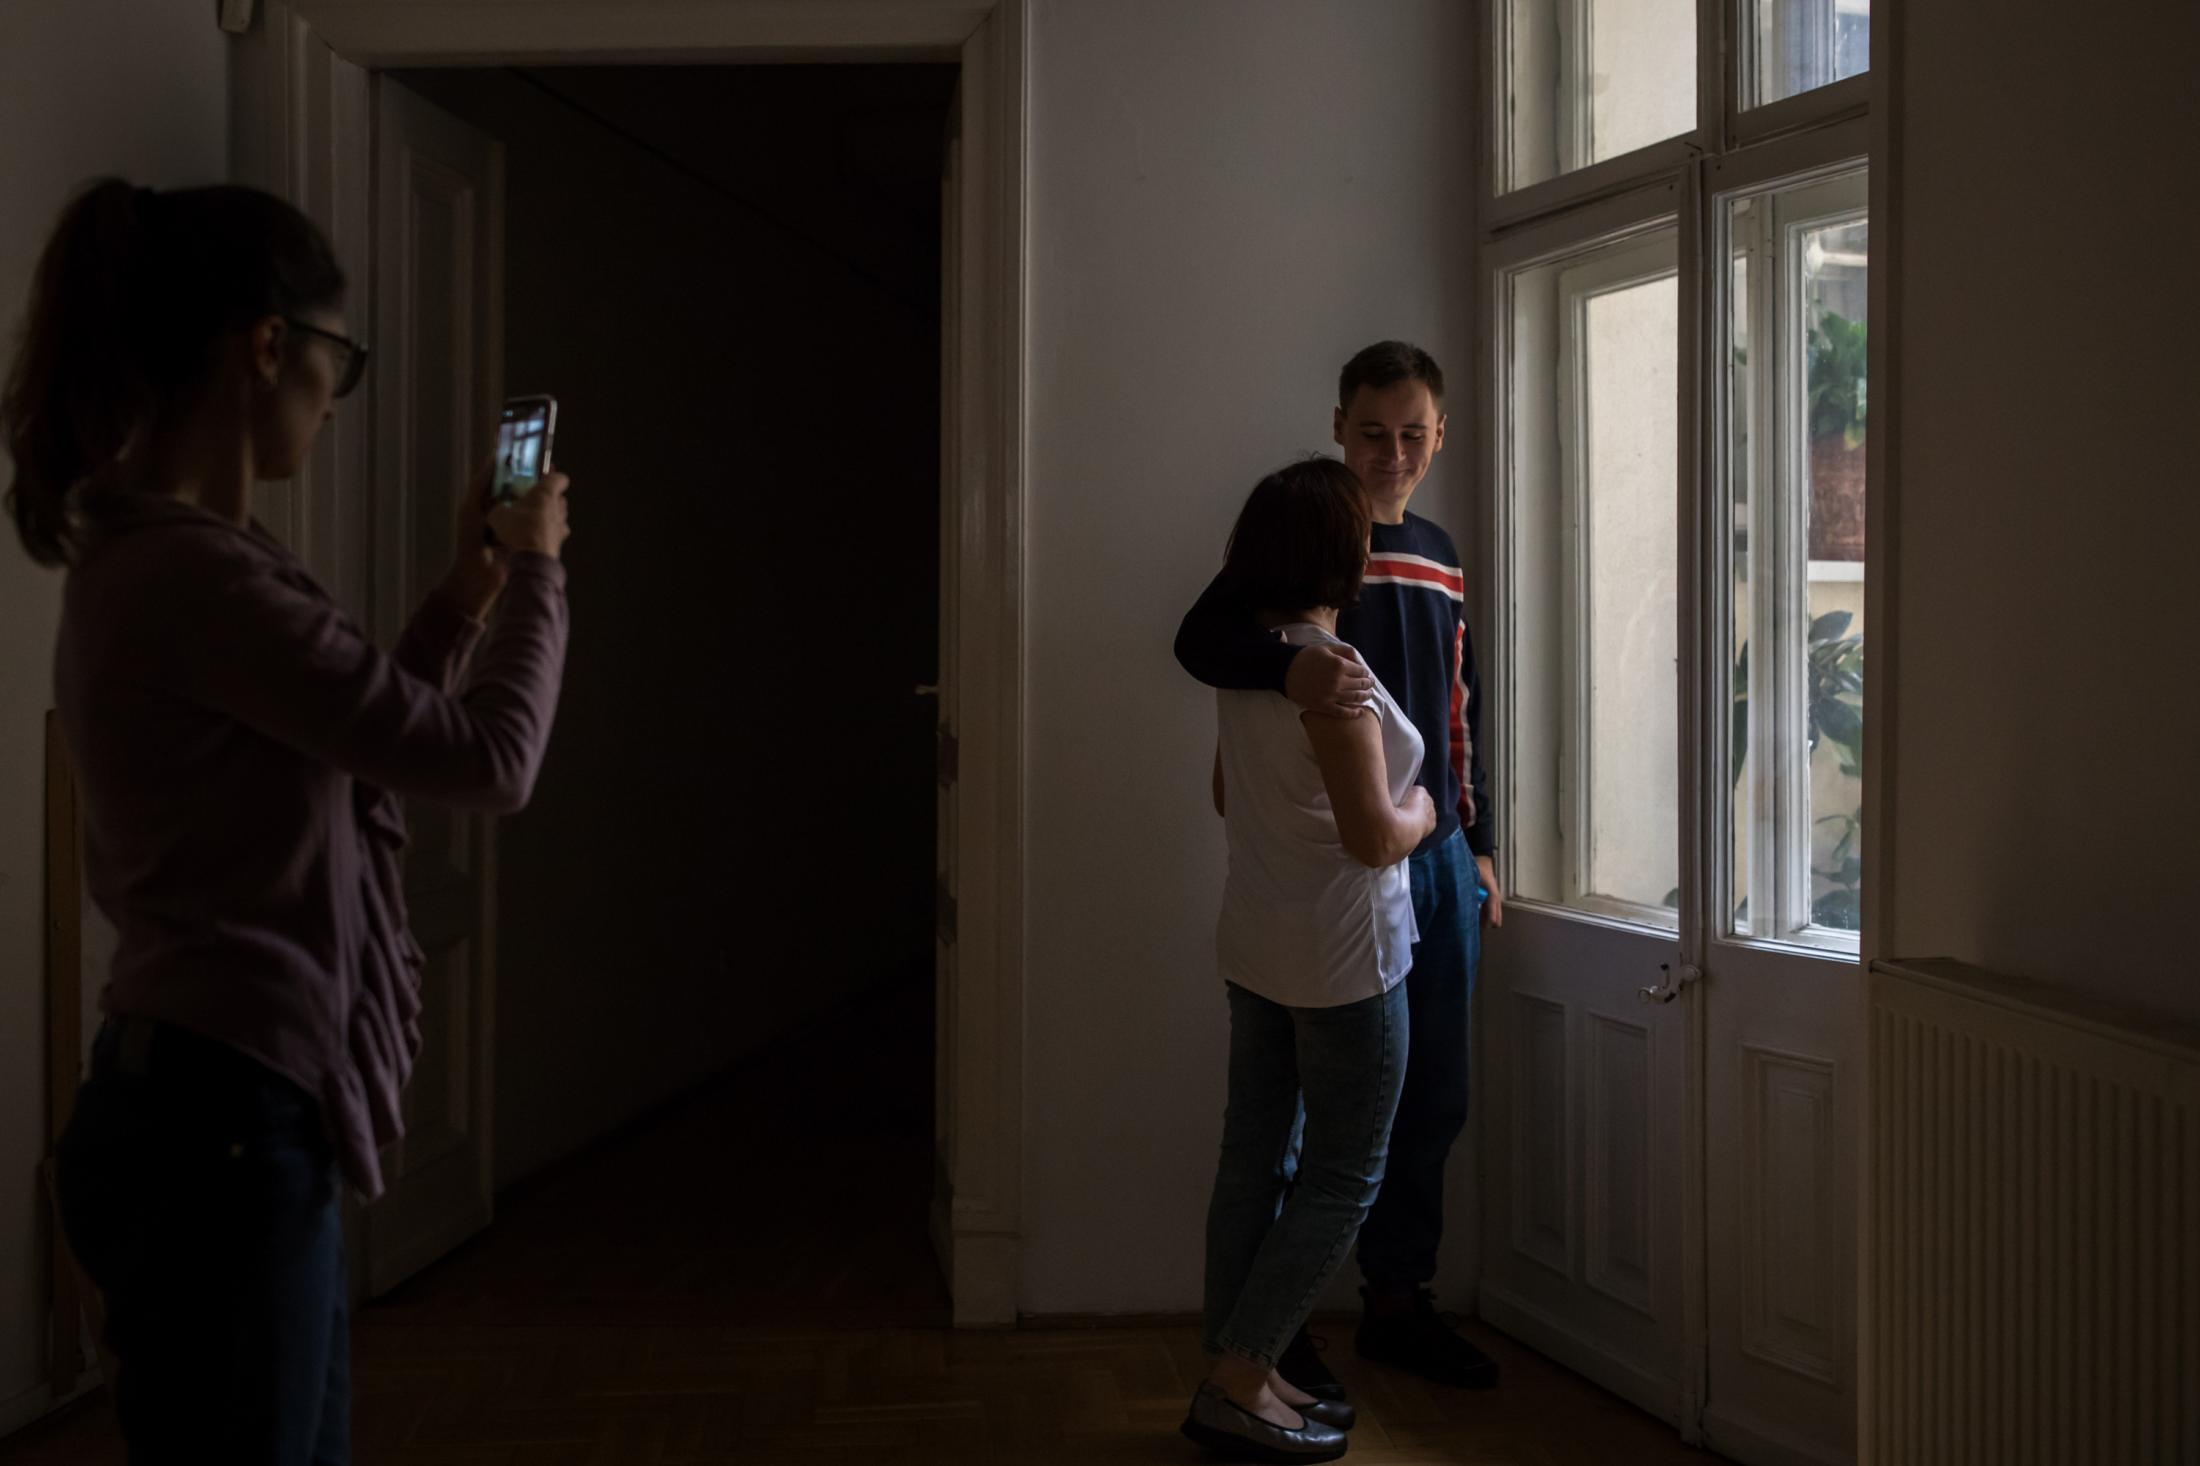 Art and Documentary Photography - Loading Anna_Liminowicz.jpg